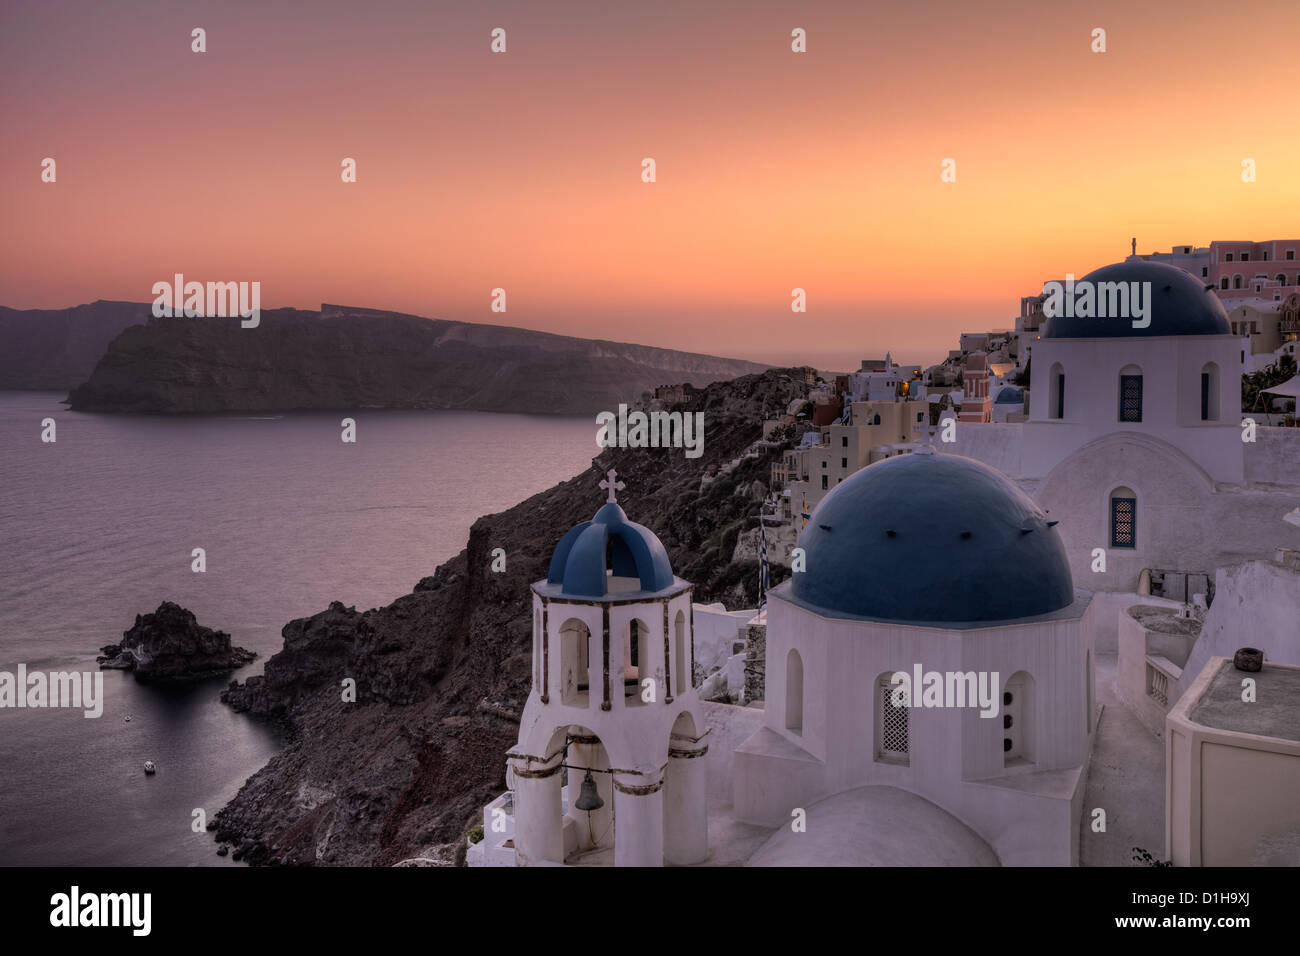 Oia Sunset in Santorini, Greece - Stock Image